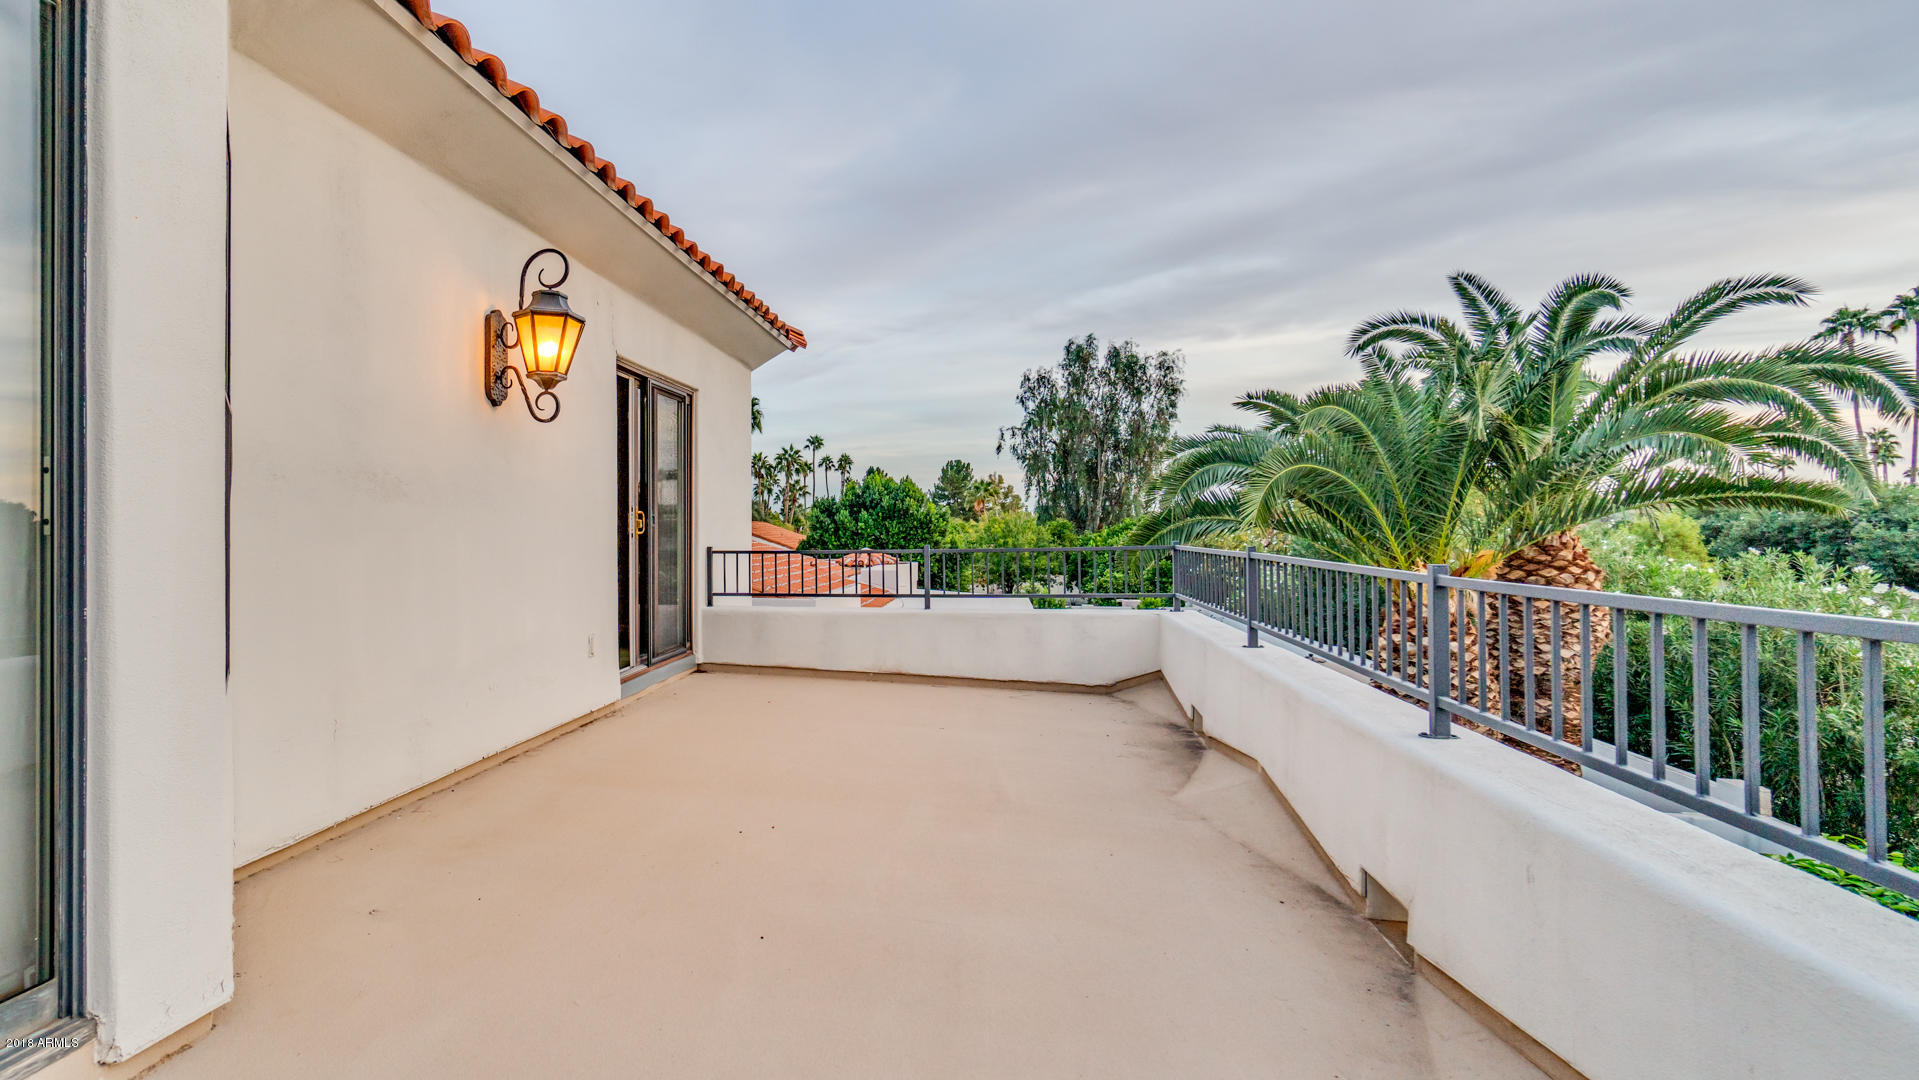 8147 E DEL BARQUERO Drive Scottsdale, AZ 85258 - MLS #: 5847826